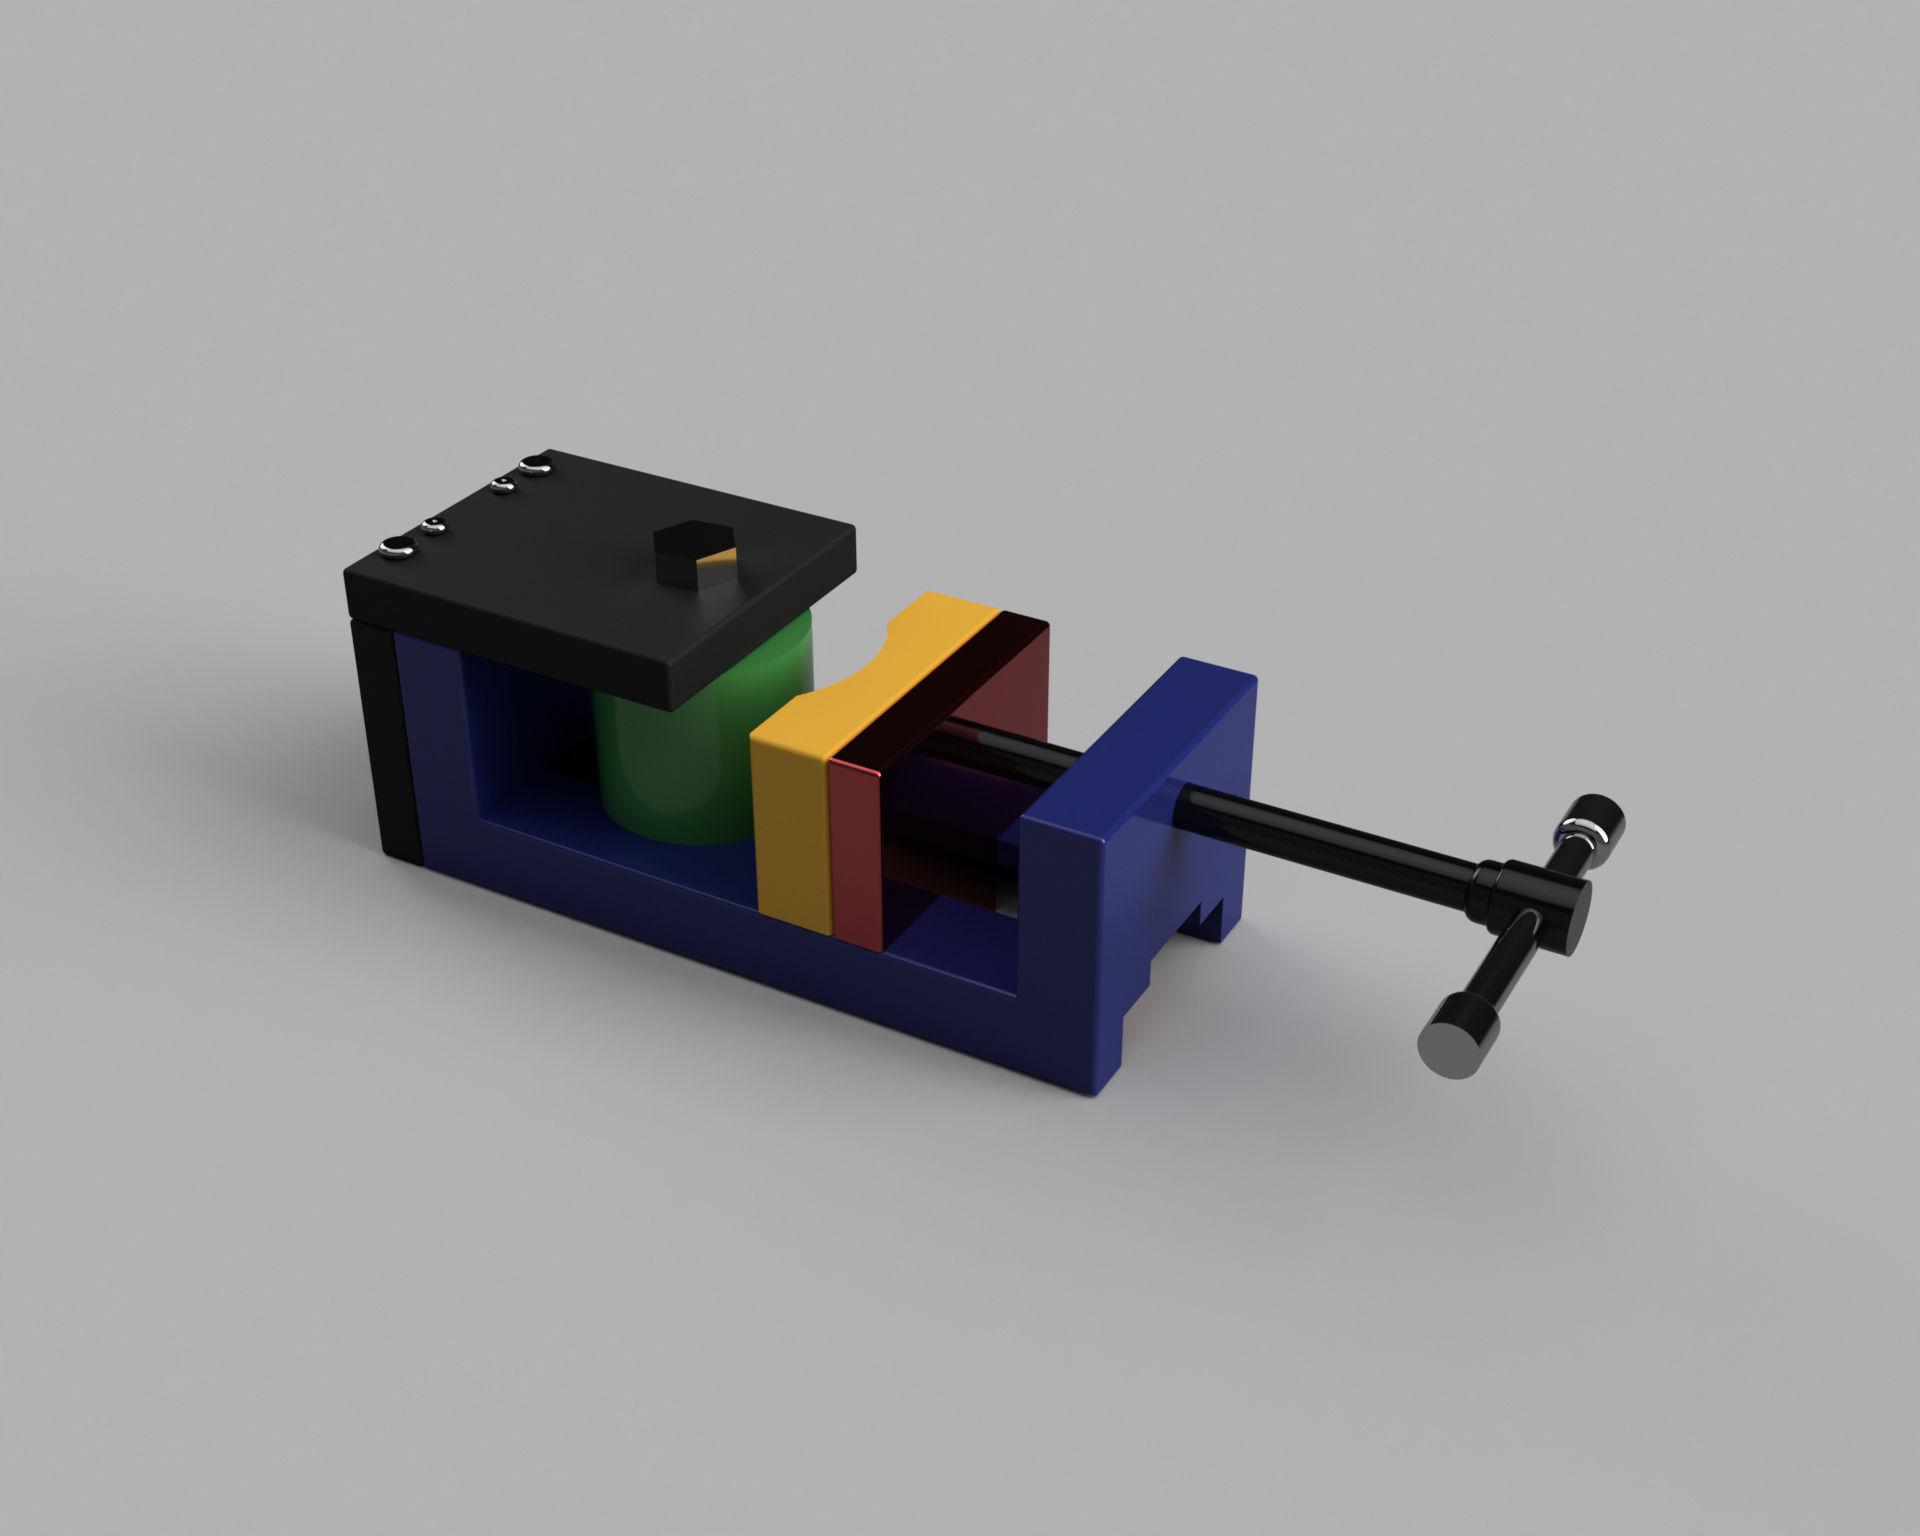 Manual jigs and fixtures